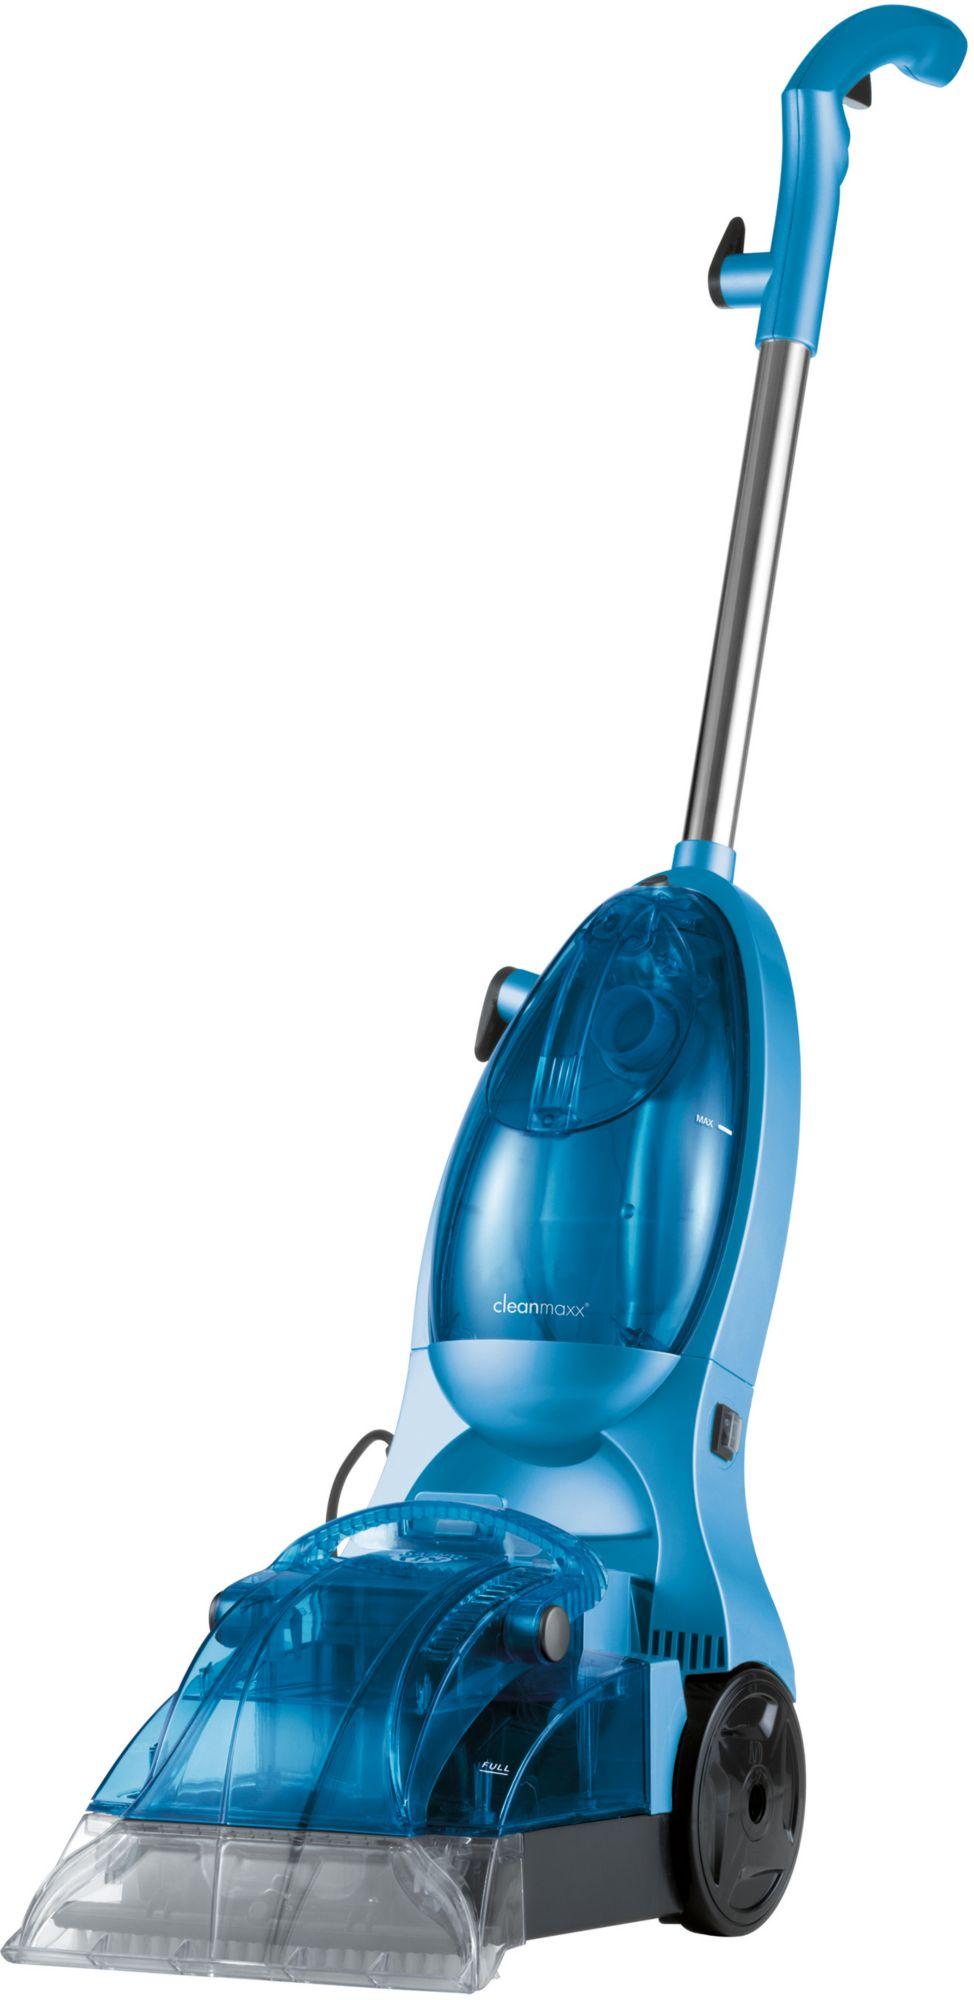 CLEAN MAXX cleanmaxx Teppichreiniger eisblau inkl. 500ml Teppichshampoo